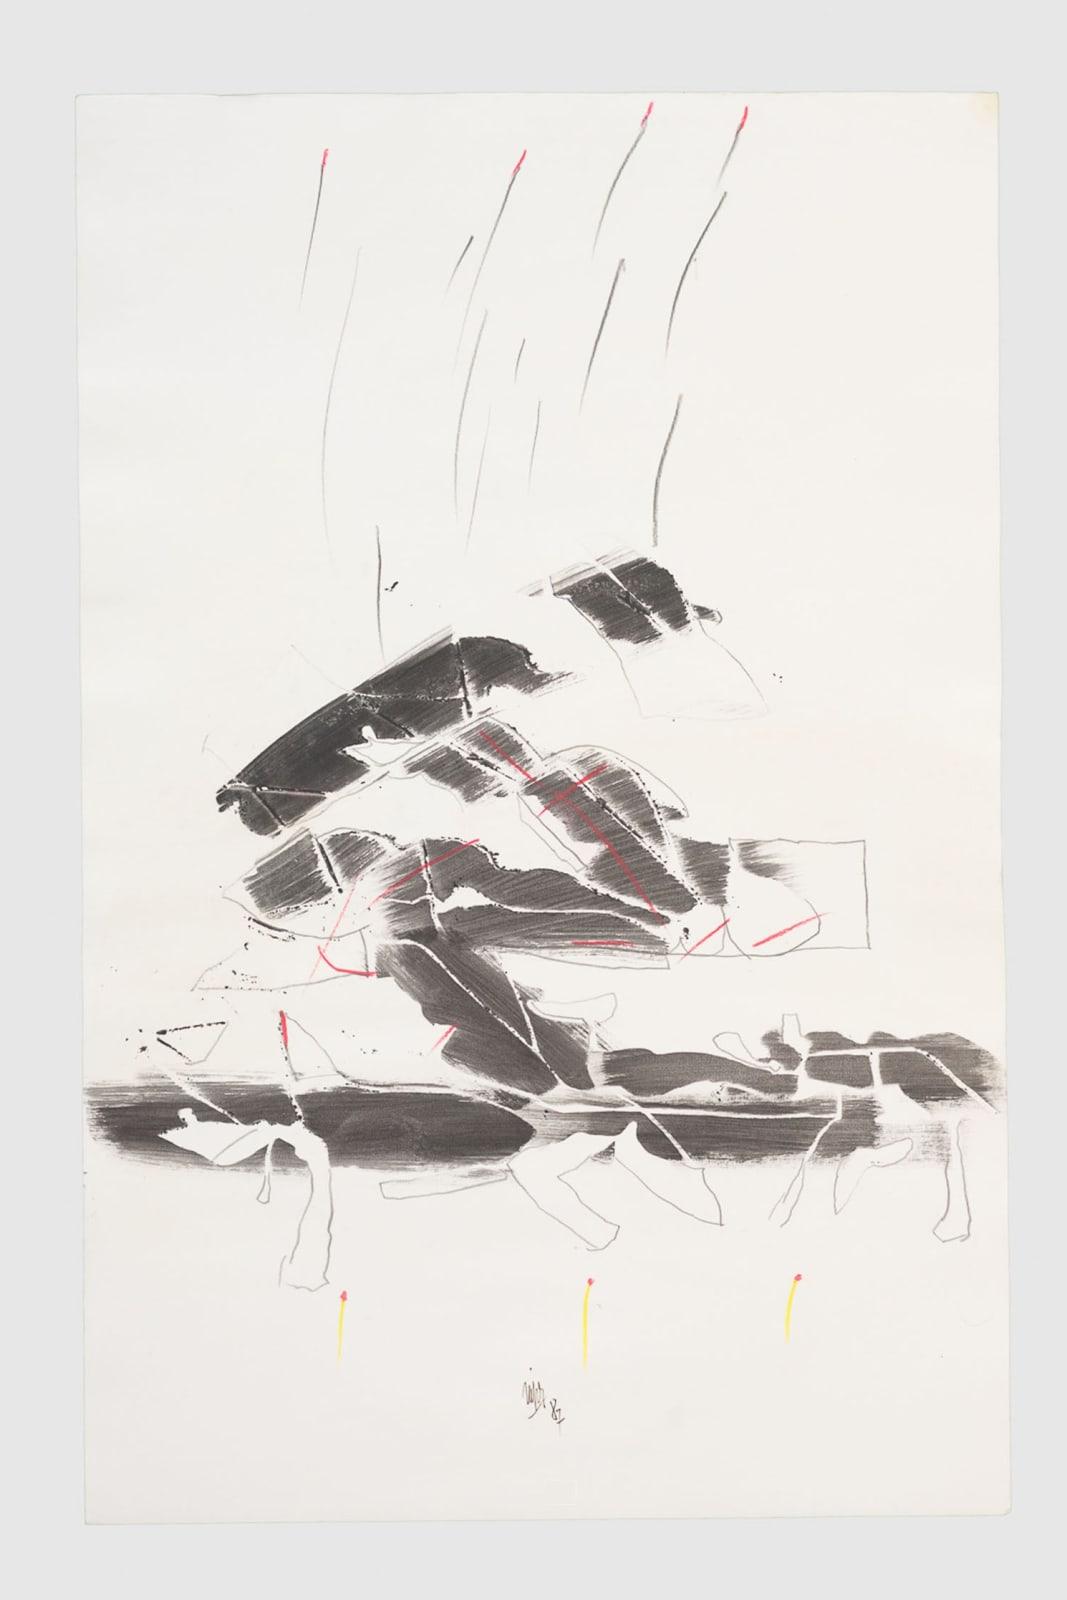 Rafik El Kamel, Untitled, 1987